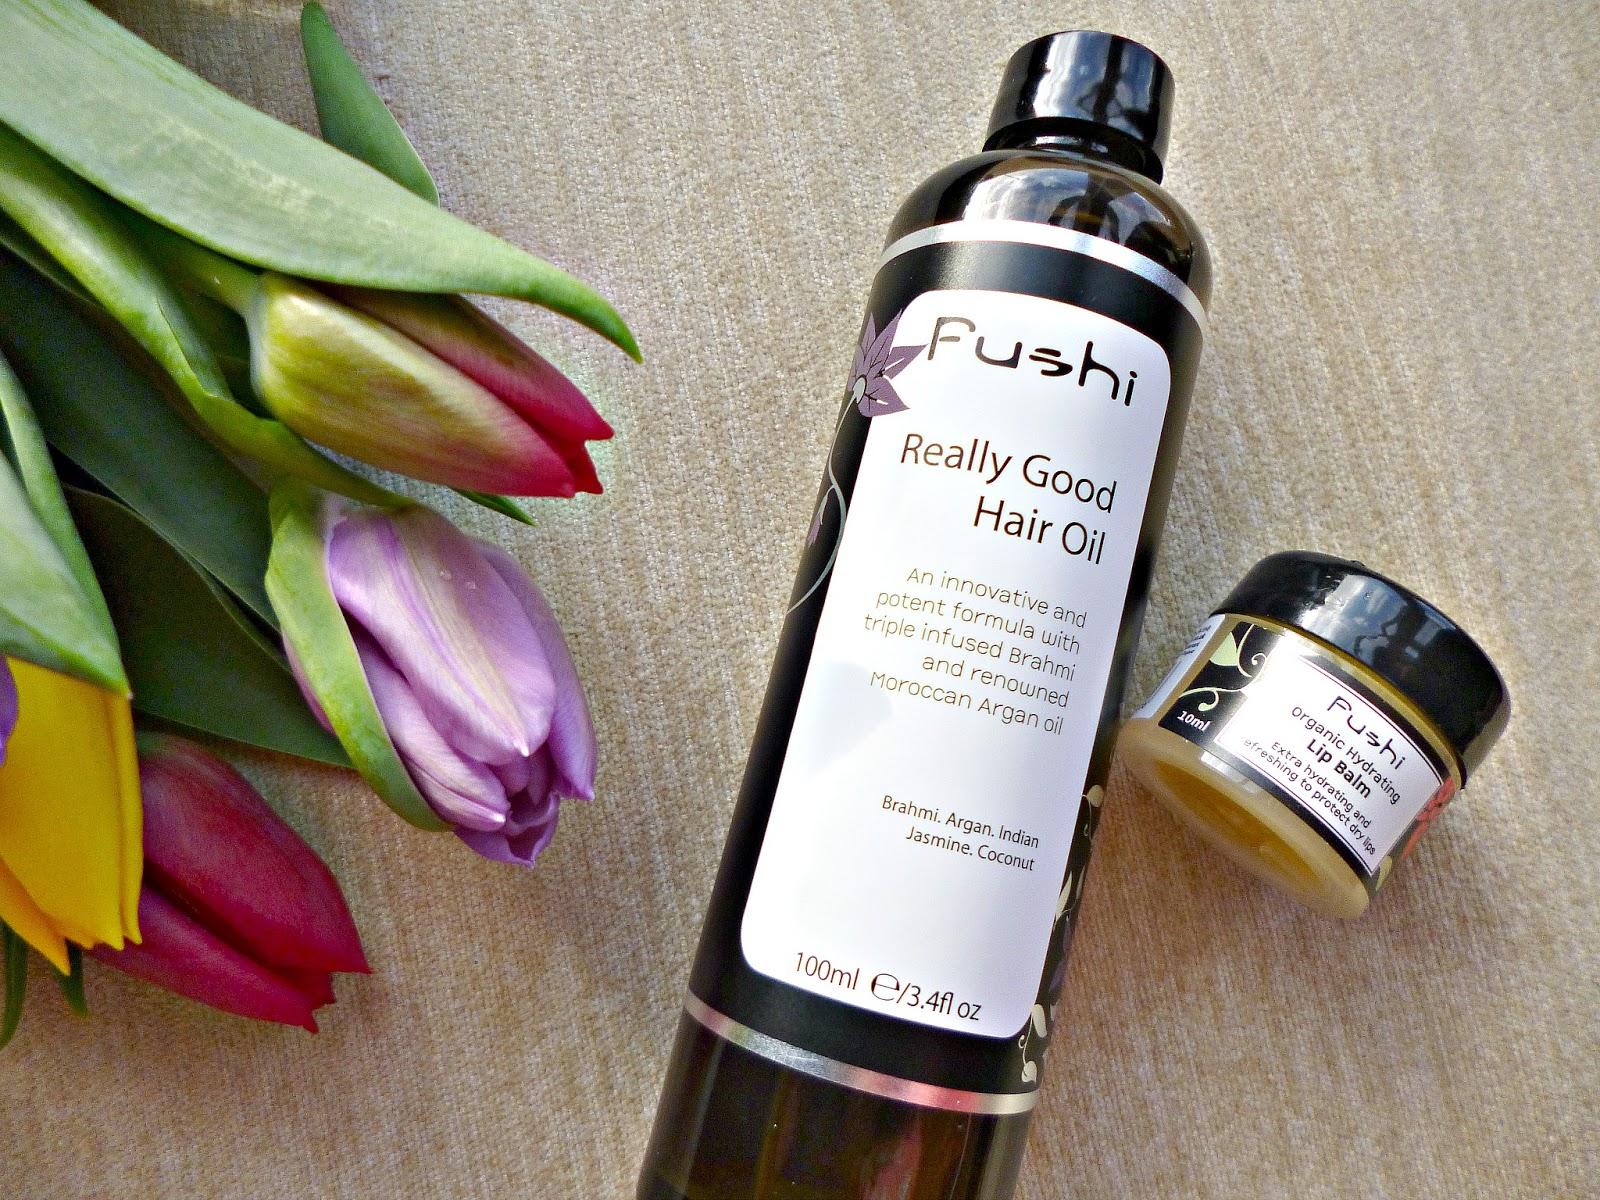 Fushi Really good hair oil and Lip balm review